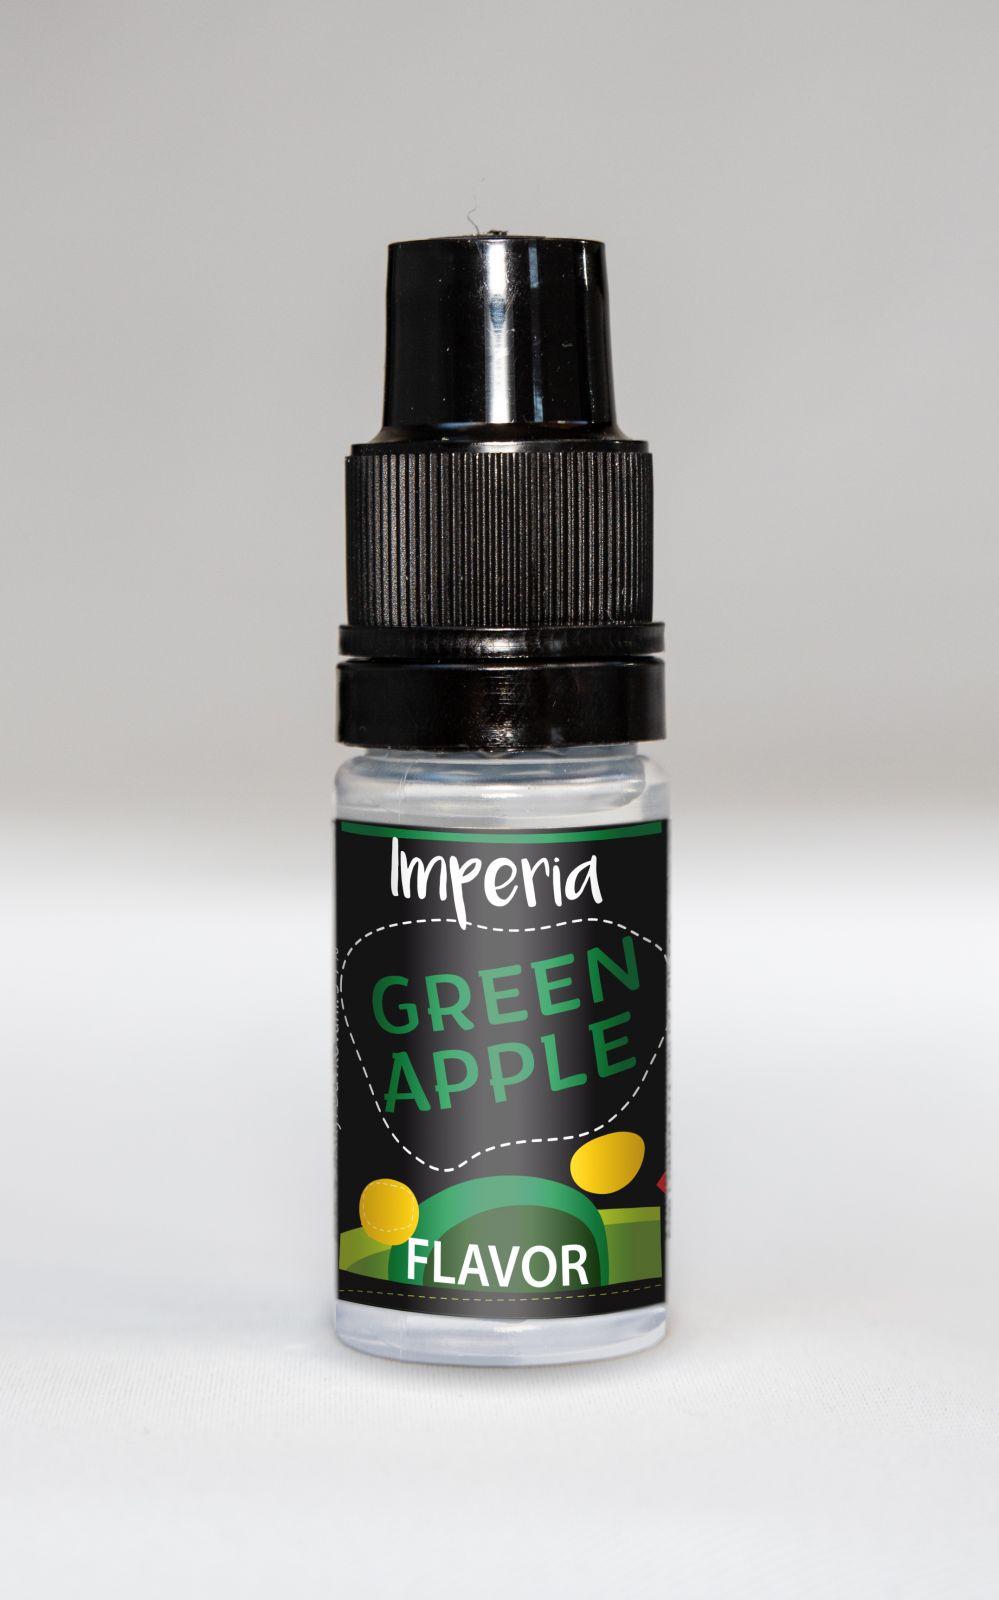 GREEN APPLE / Zelené jablko - Aróma Imperia Black Label Boudoir Samadhi s.r.o.